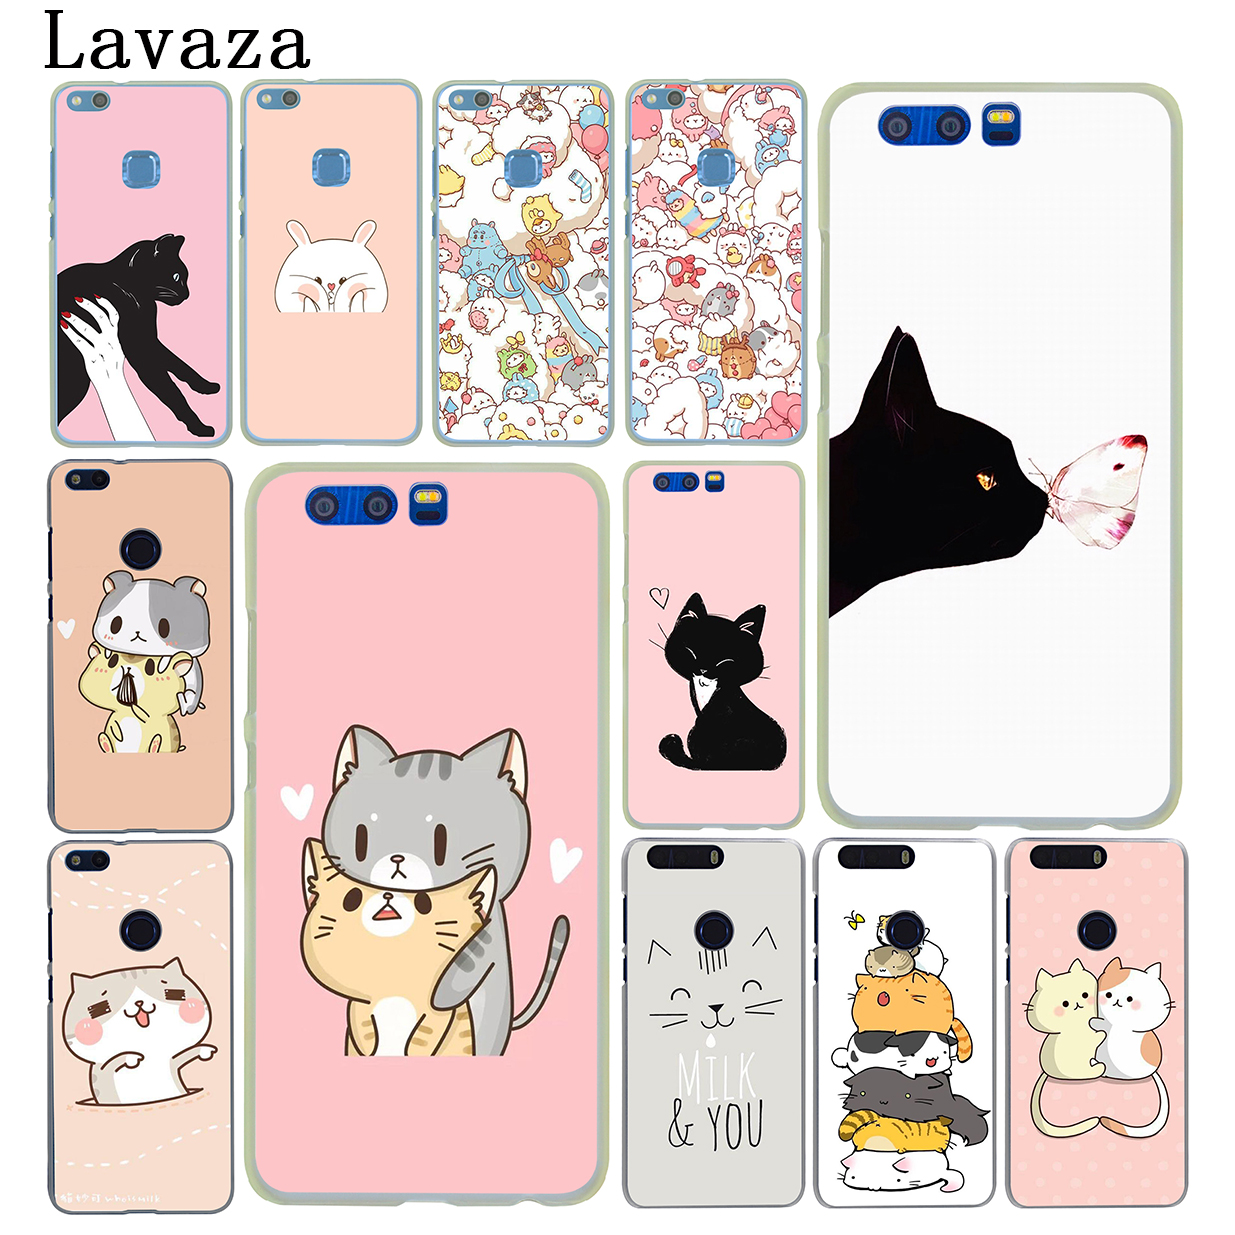 Lavaza Kawaii Molang Cartoon Anime dog cat Hard Case for Huawei Honor 6A 7X 7C 7A 6C Pro 8 9 10 Lite 8C 8X Mate 10 20 Lite Pro Собака